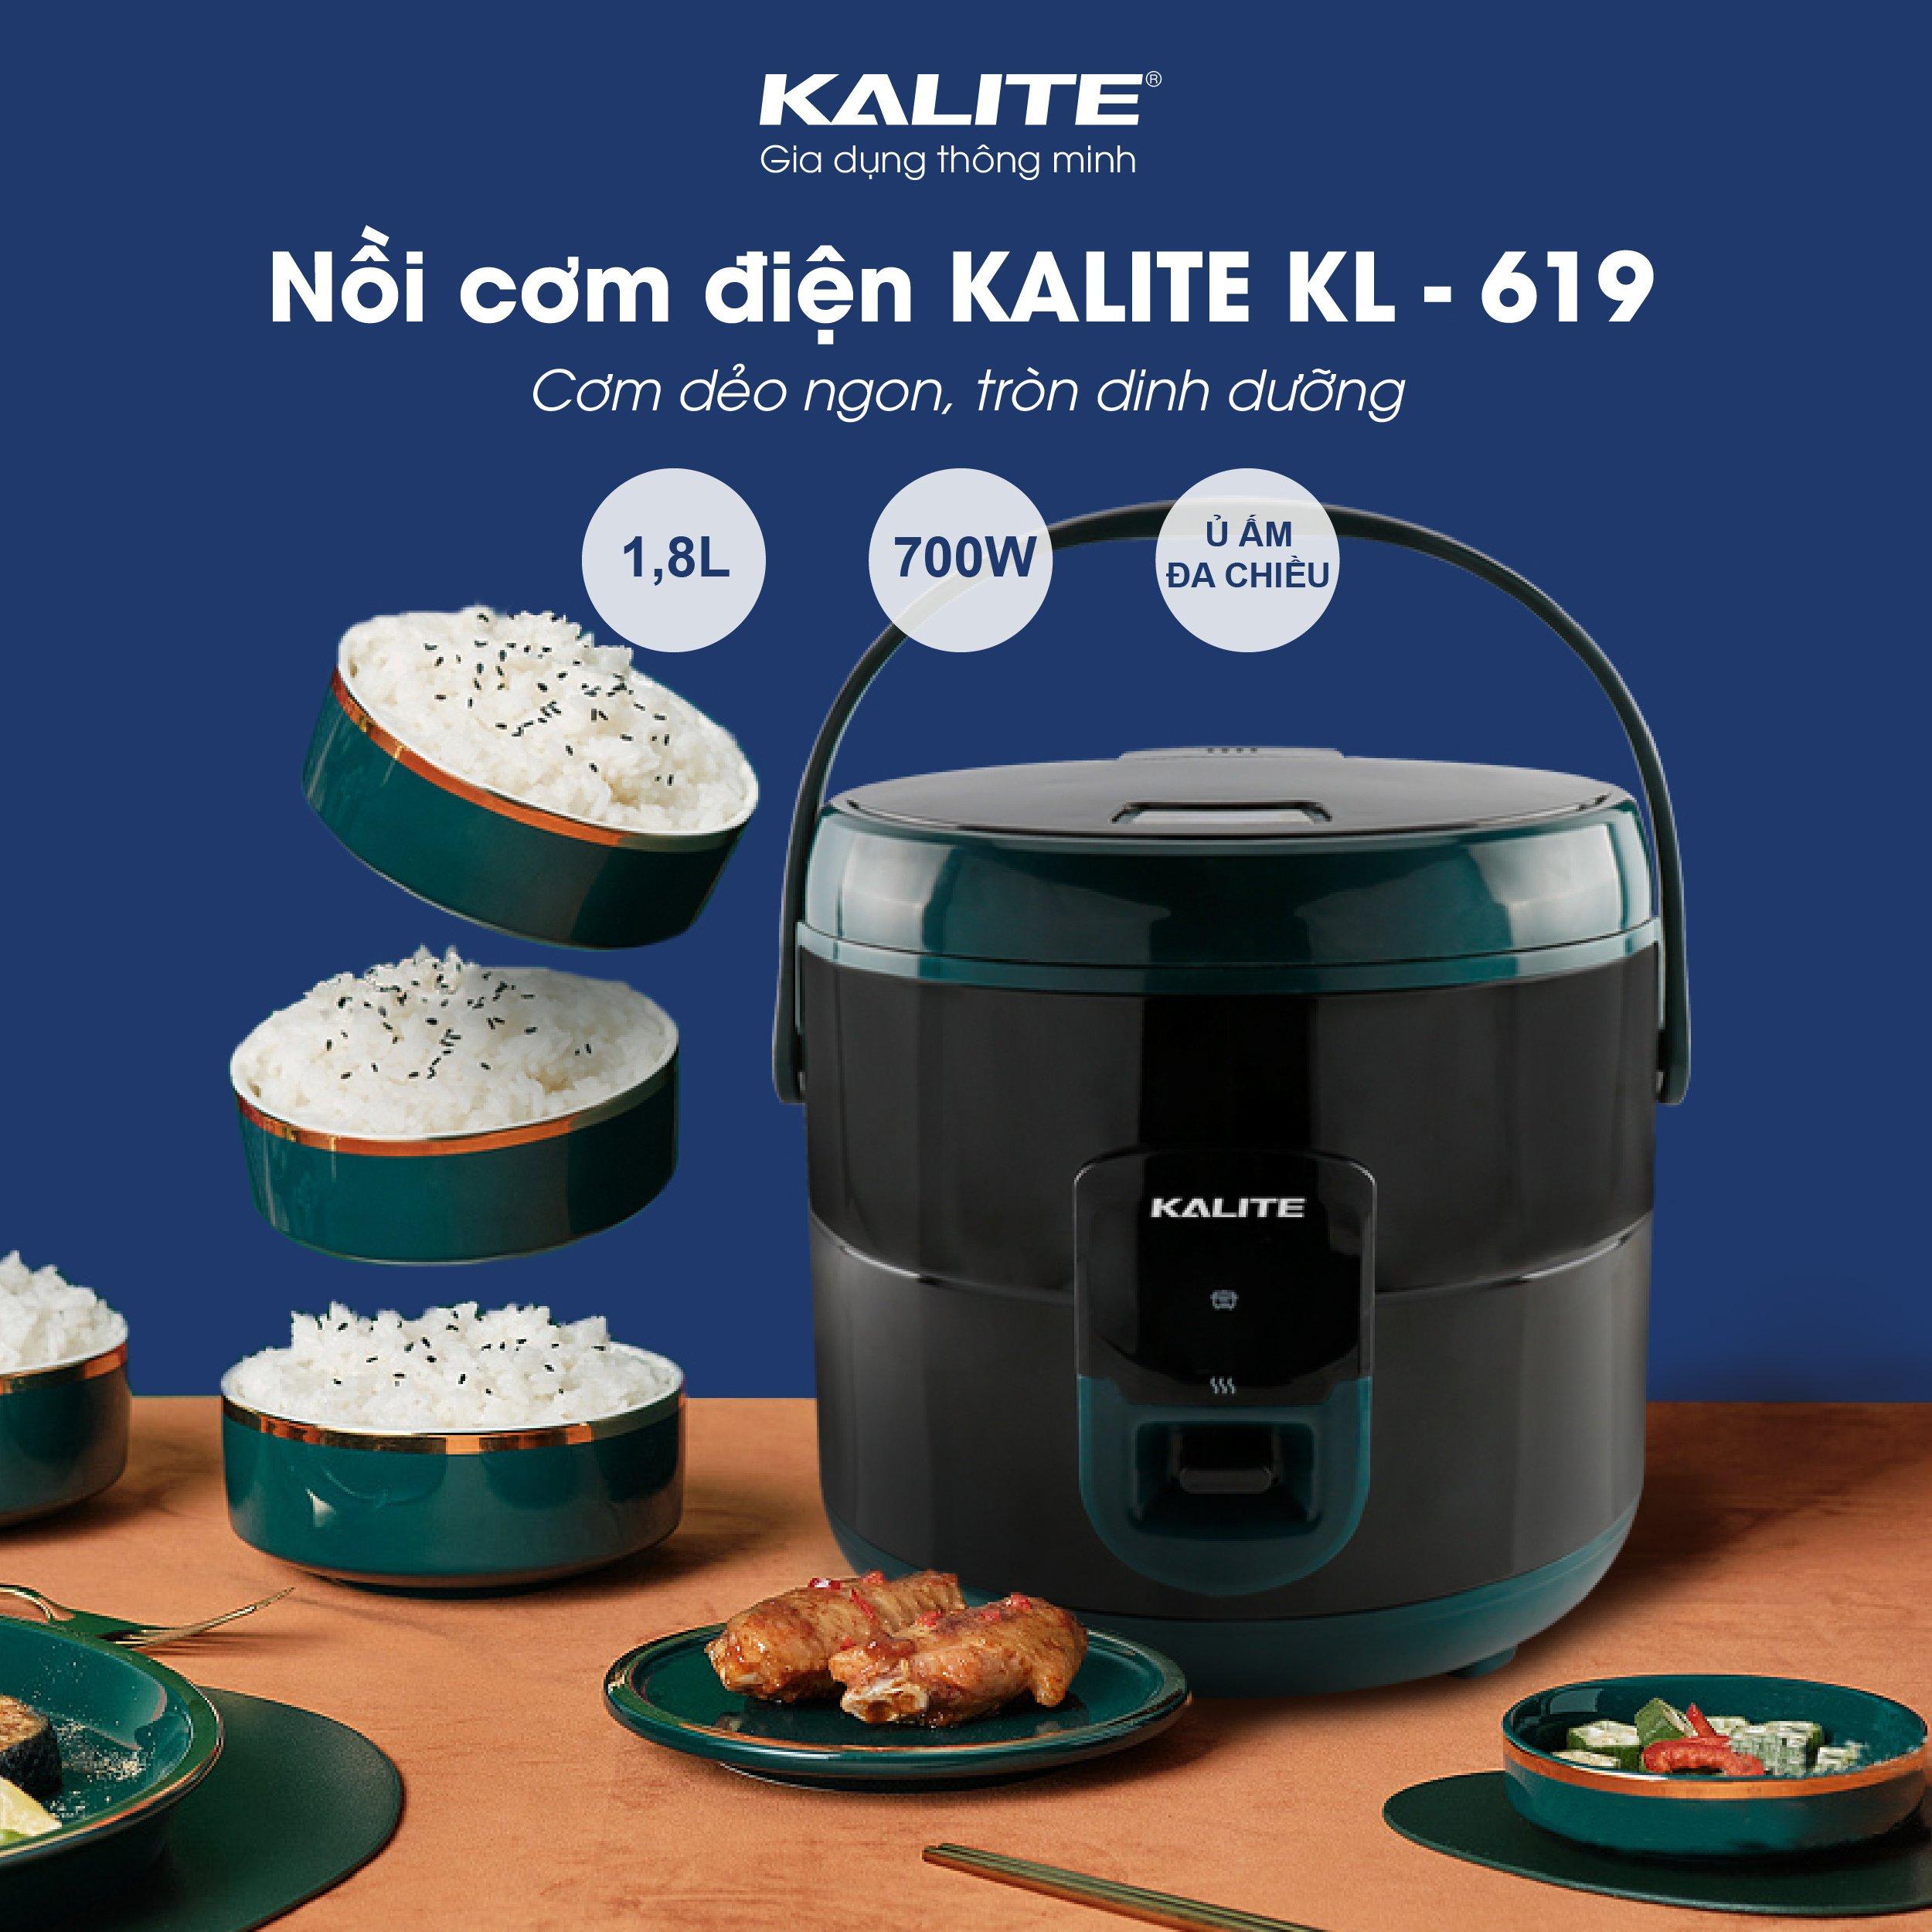 noicomdien-kalite-kl619-2